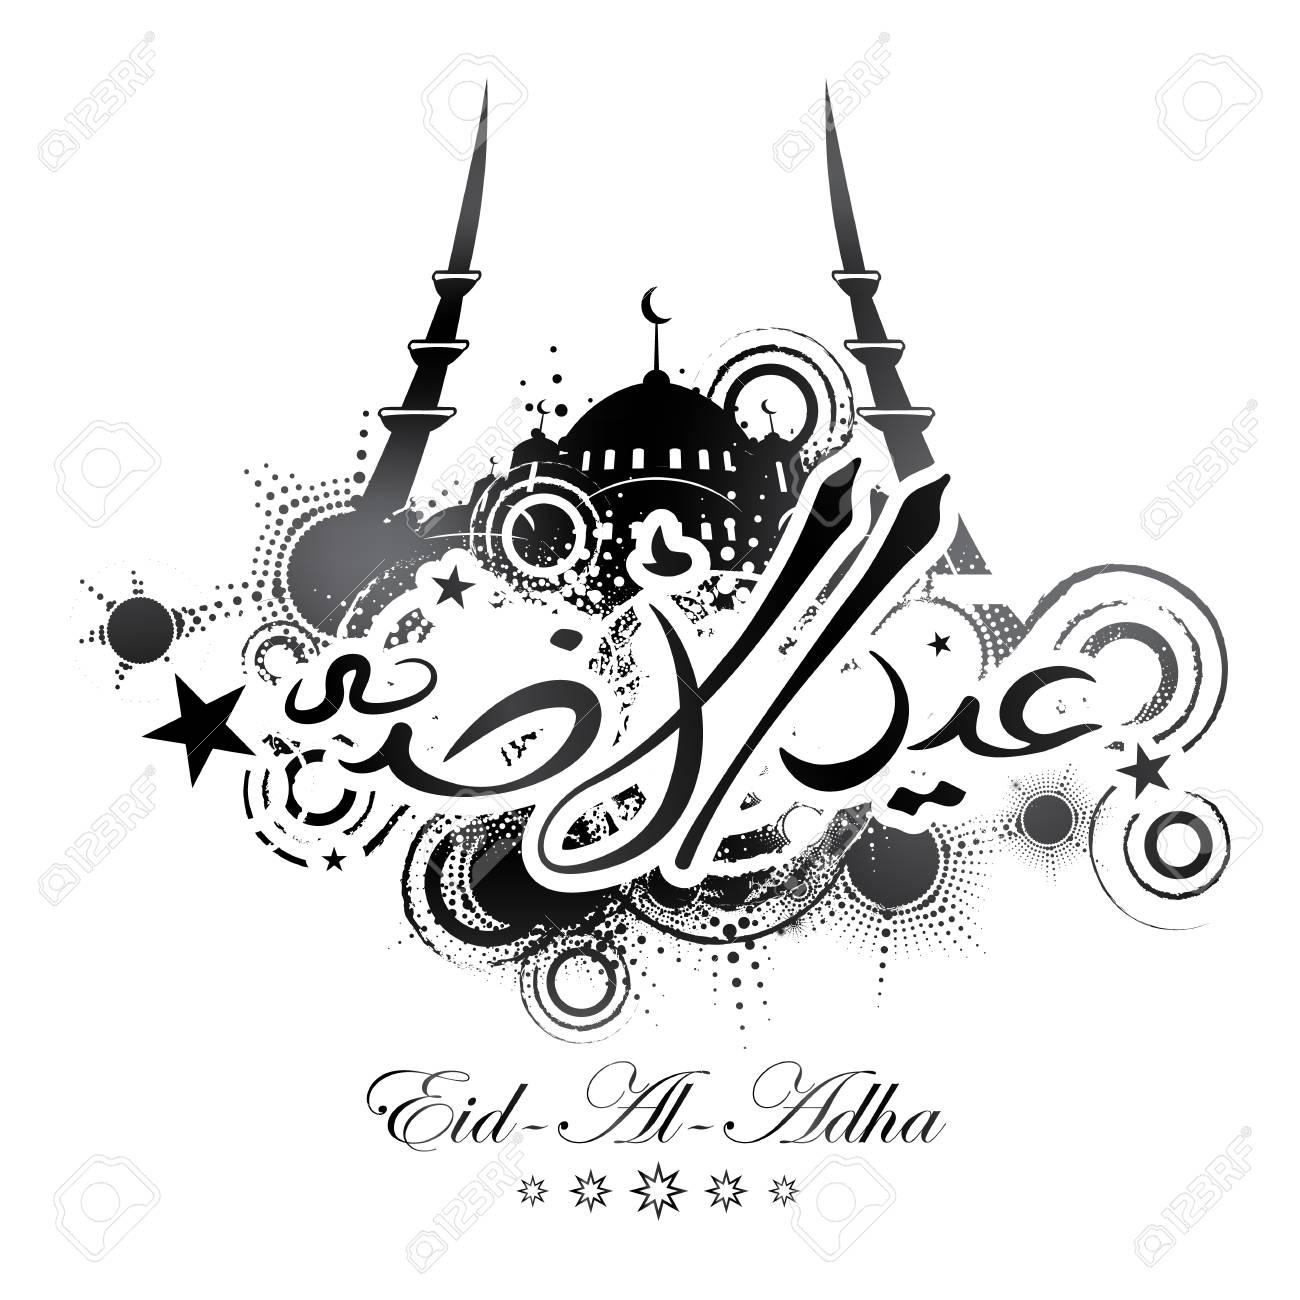 EID al Adha greeting cards, religious themed background retro,